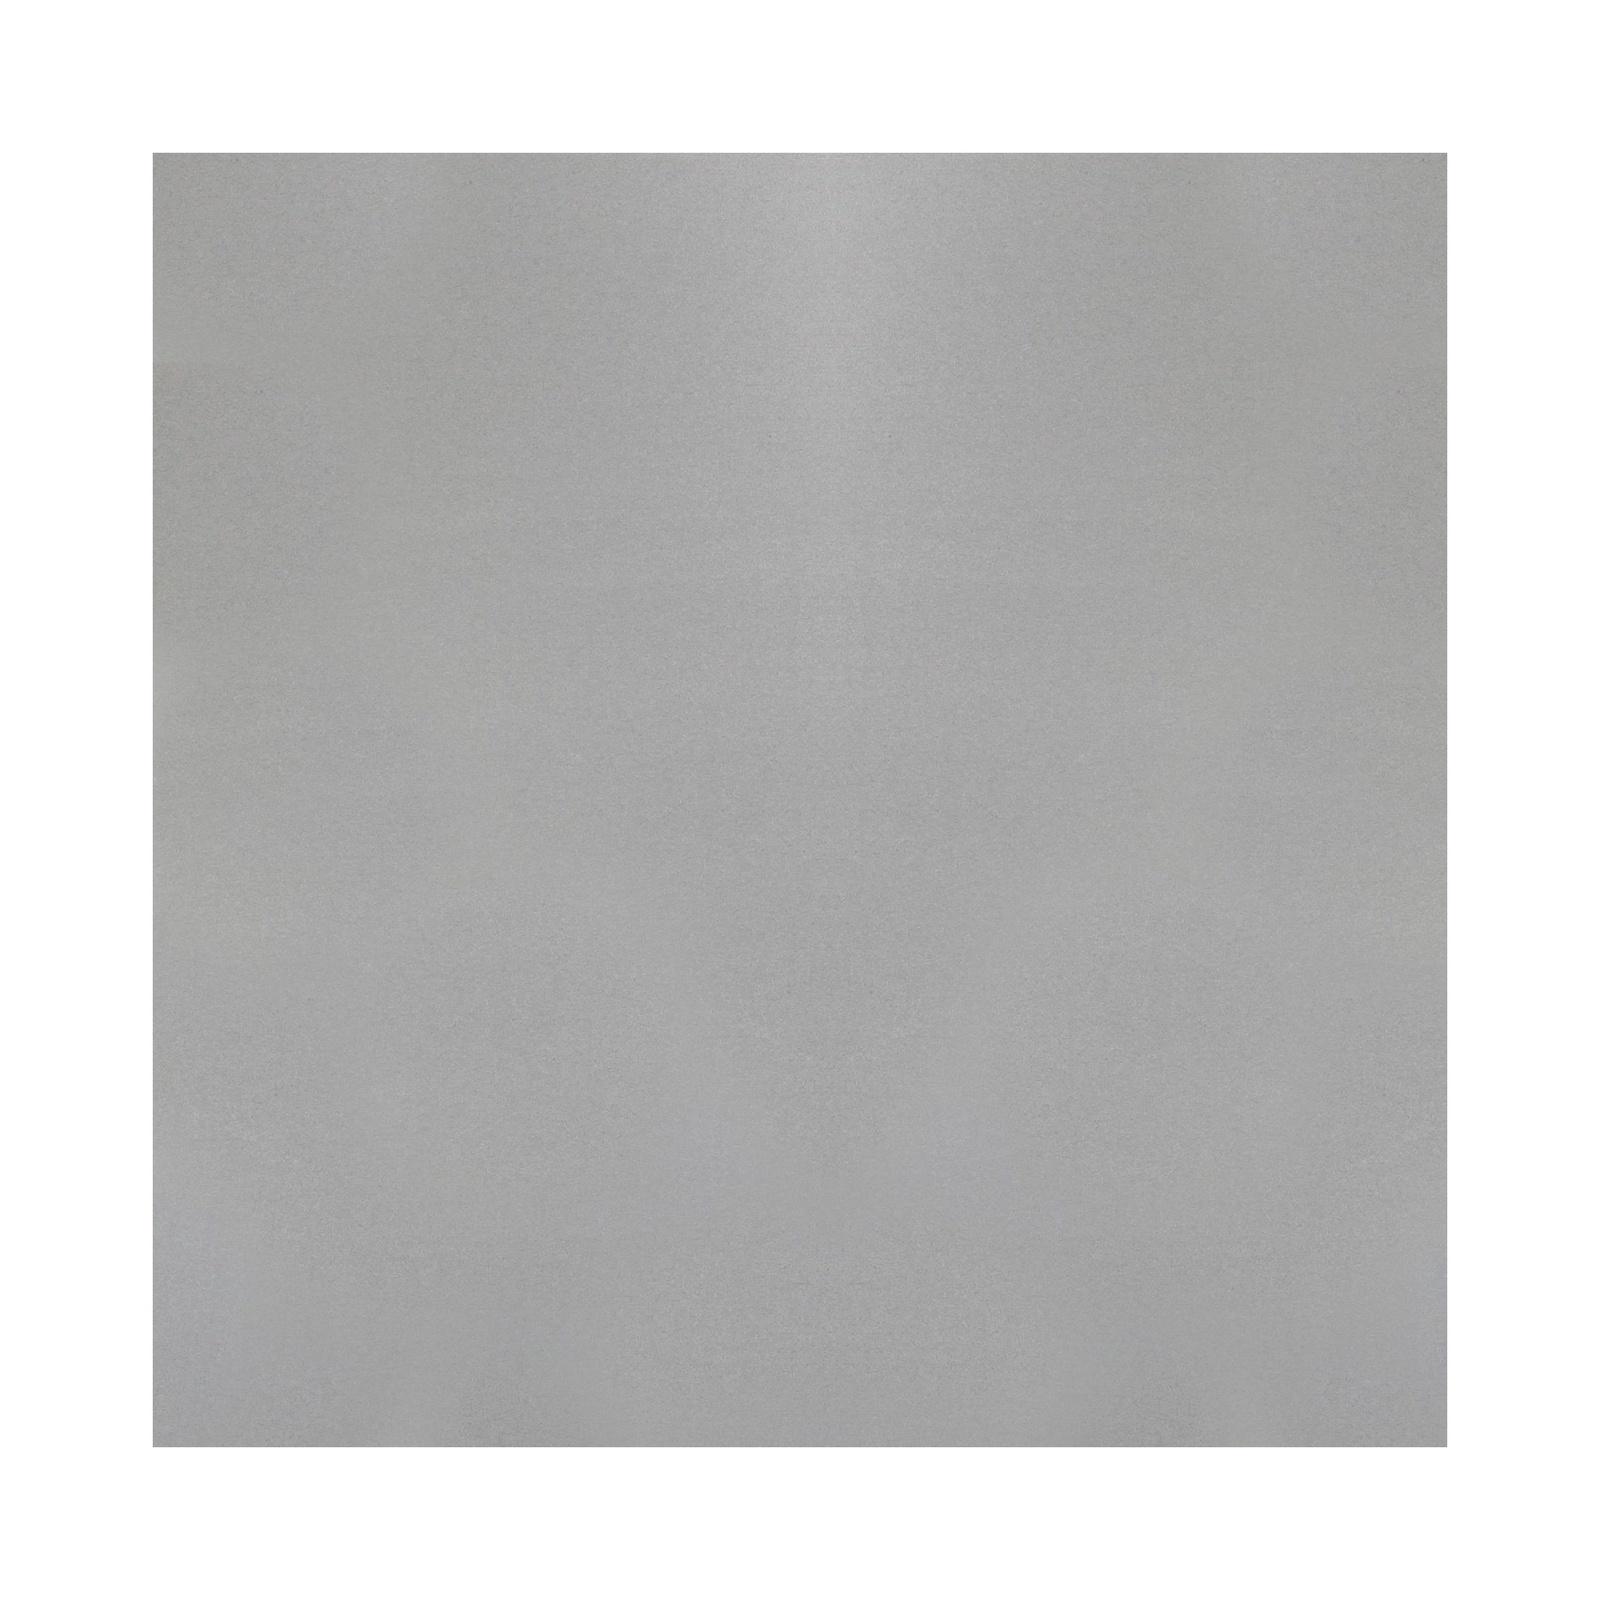 Лист алюминиевый, Gah Alberts, шлифованный, 600x1000x0,5 мм